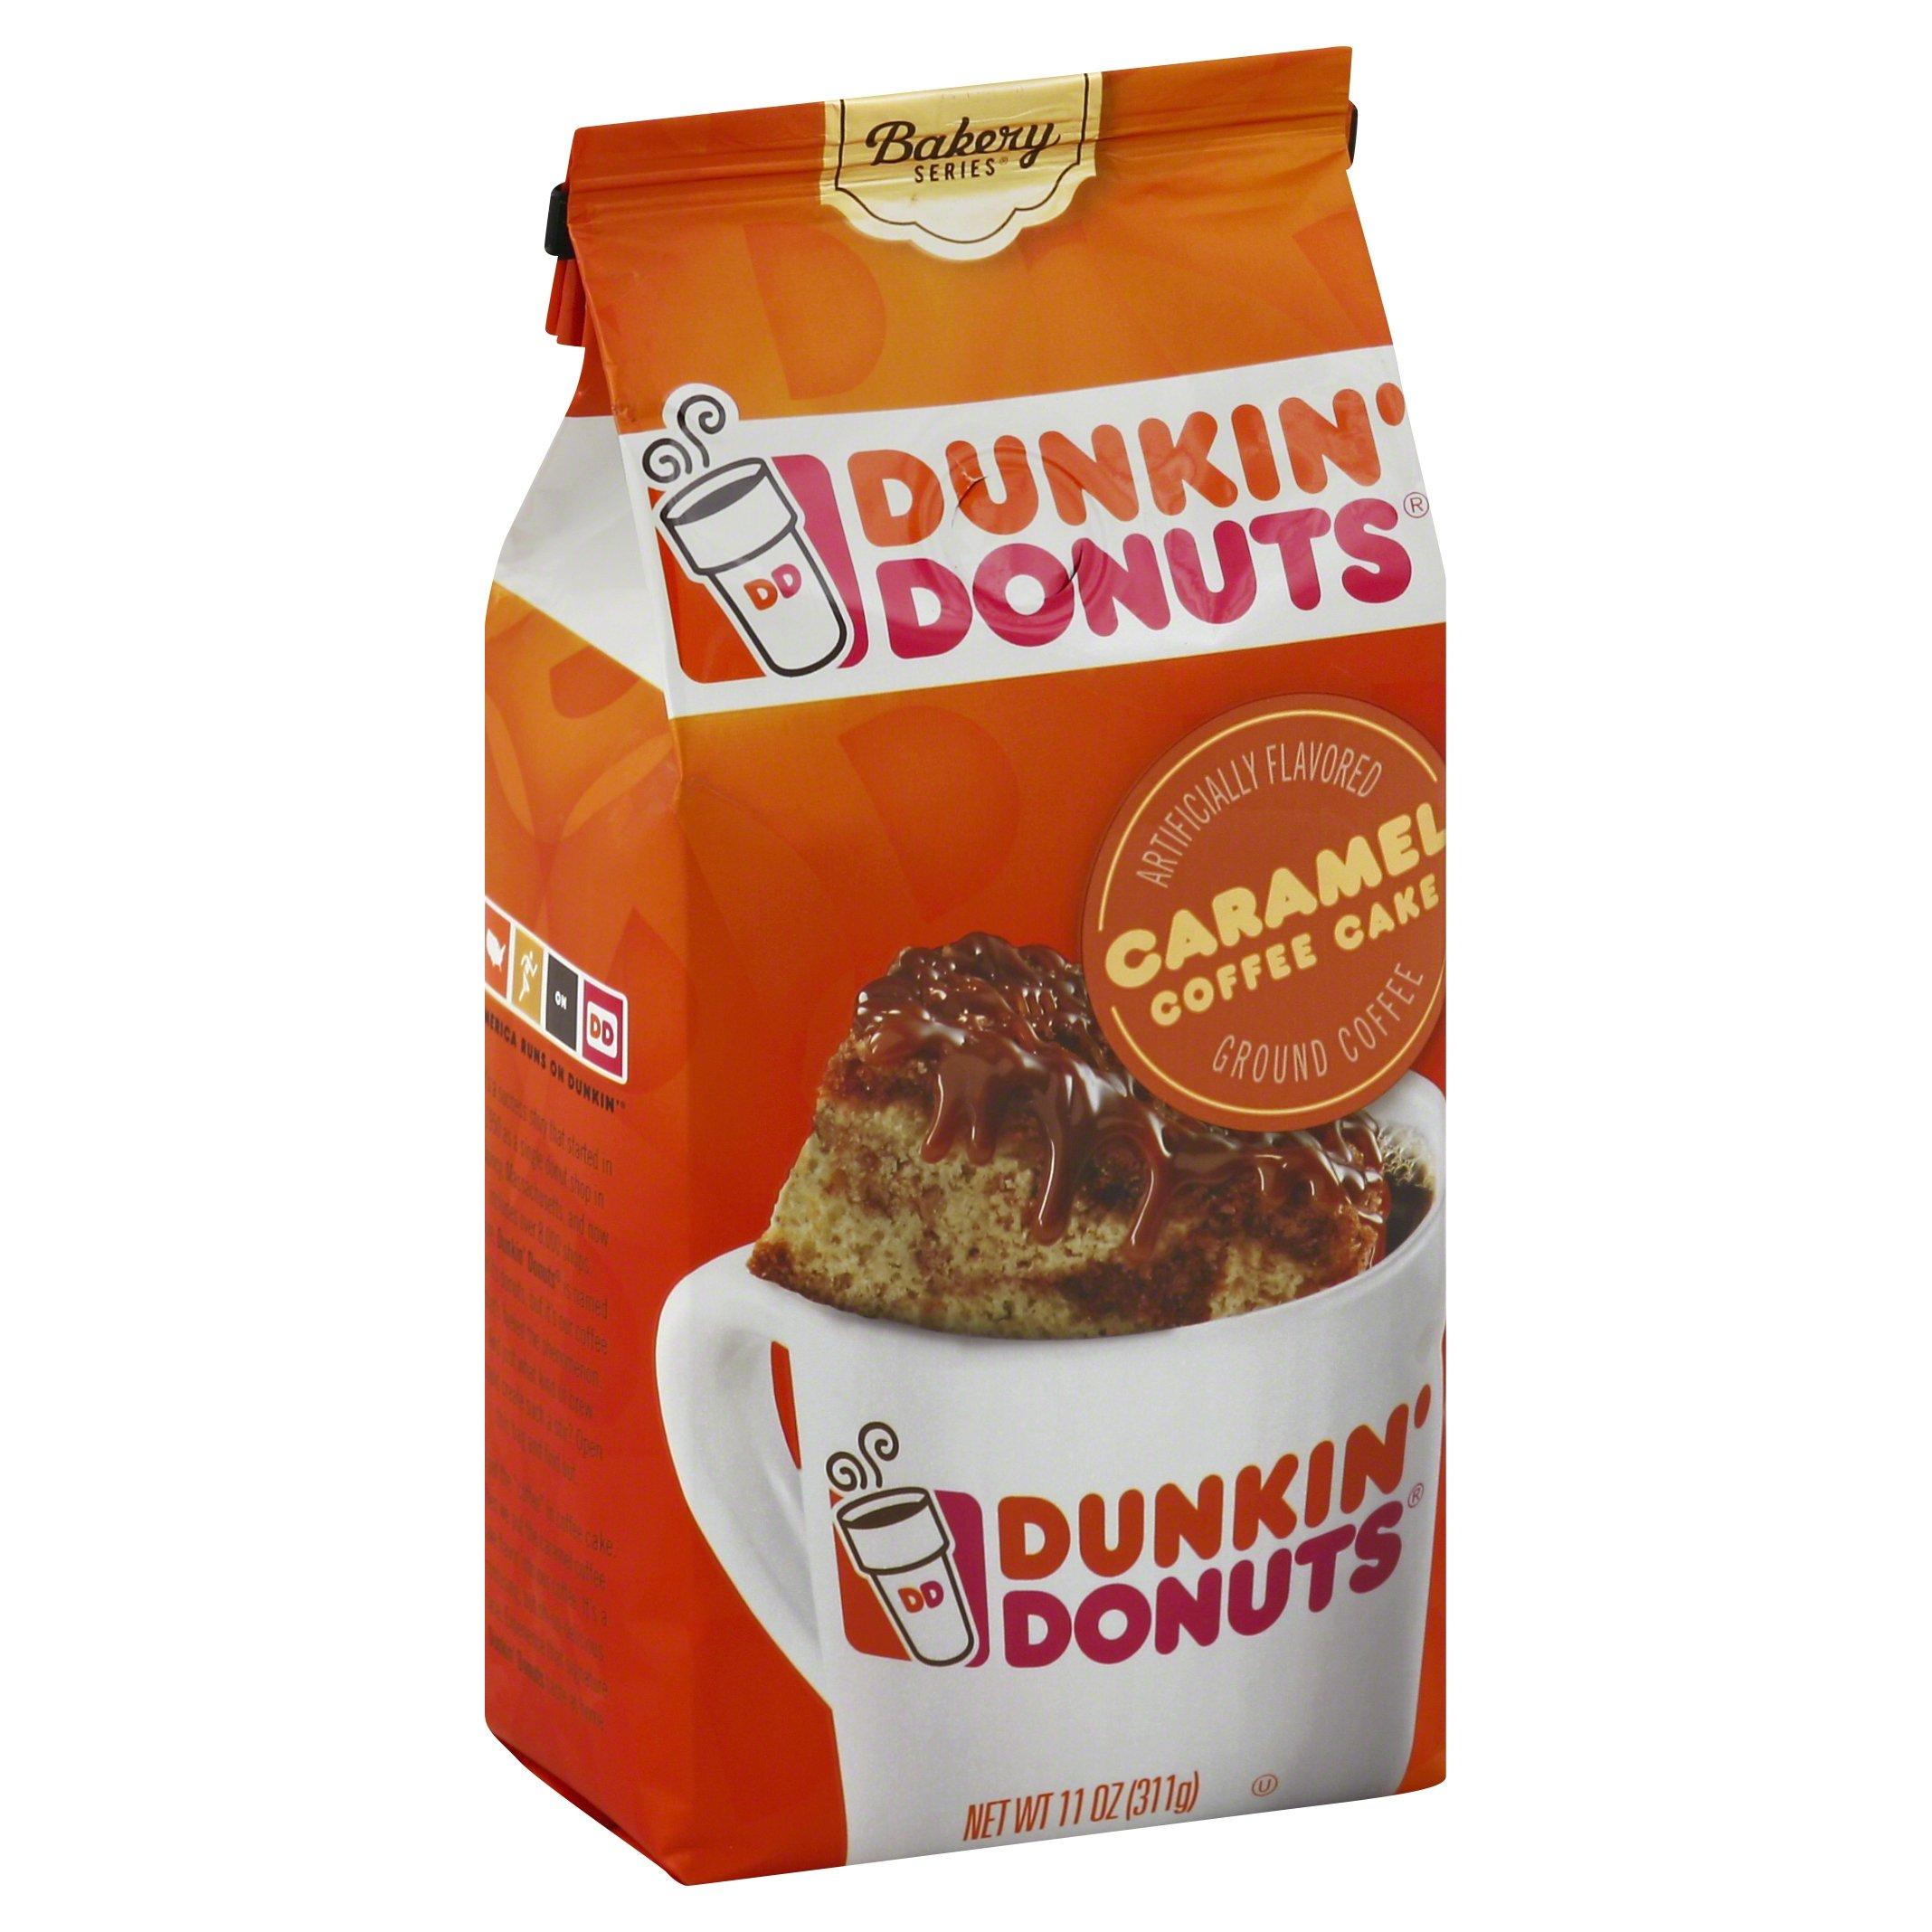 Dunkin' Donuts Bakery Series Ground Coffee, Caramel Coffee Cake, 11 oz